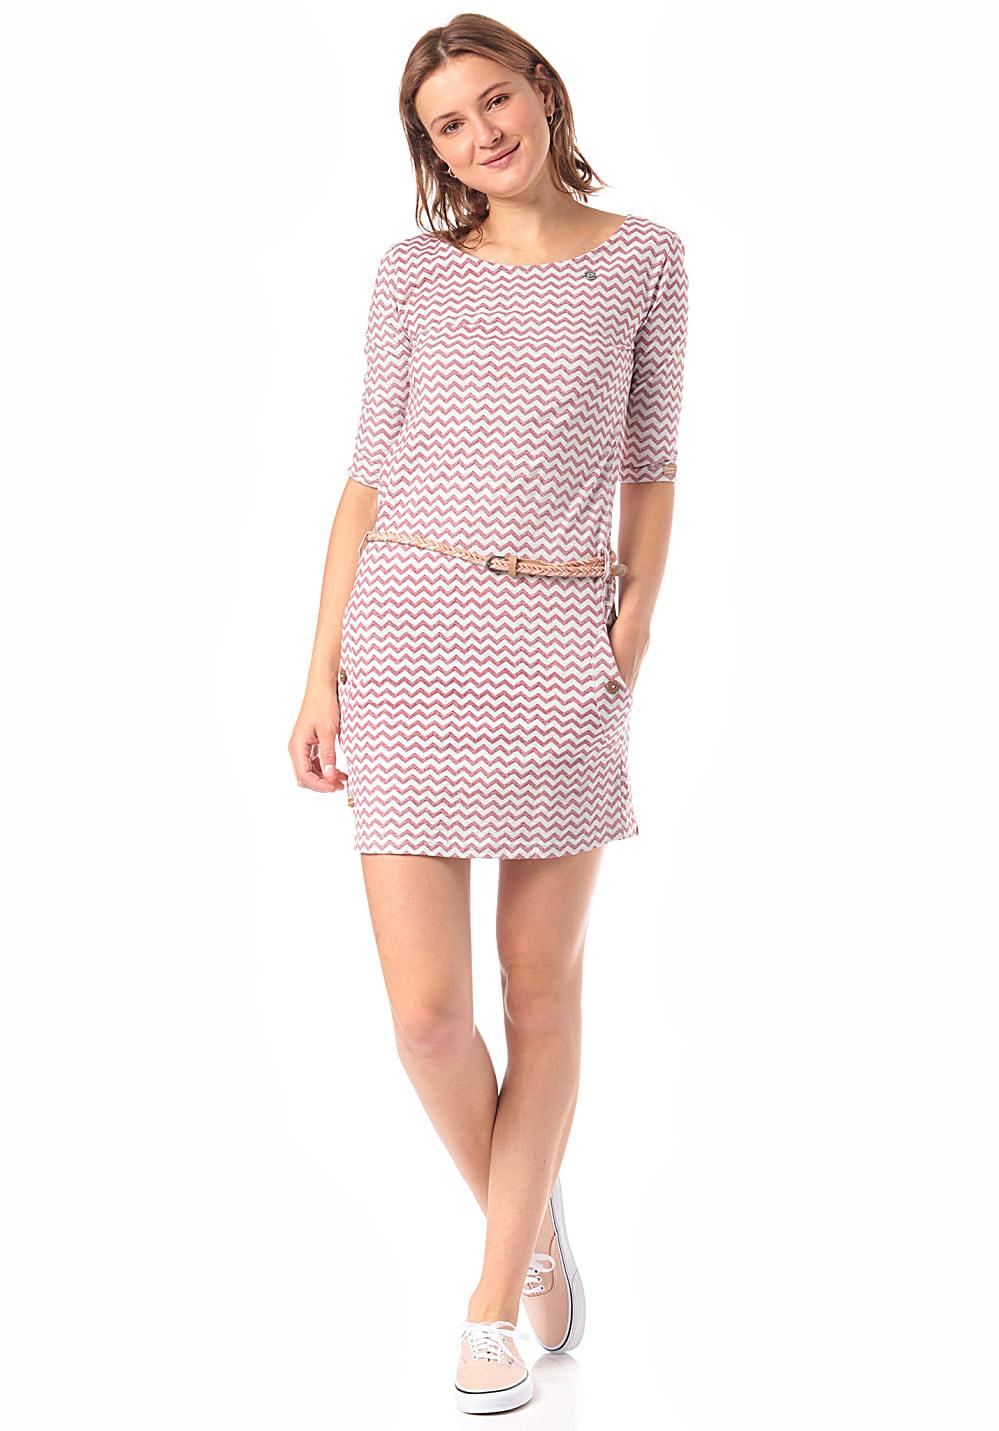 Ragwear Tanya Zig Zag  Kleid Für Damen  Pink  Planet Sports